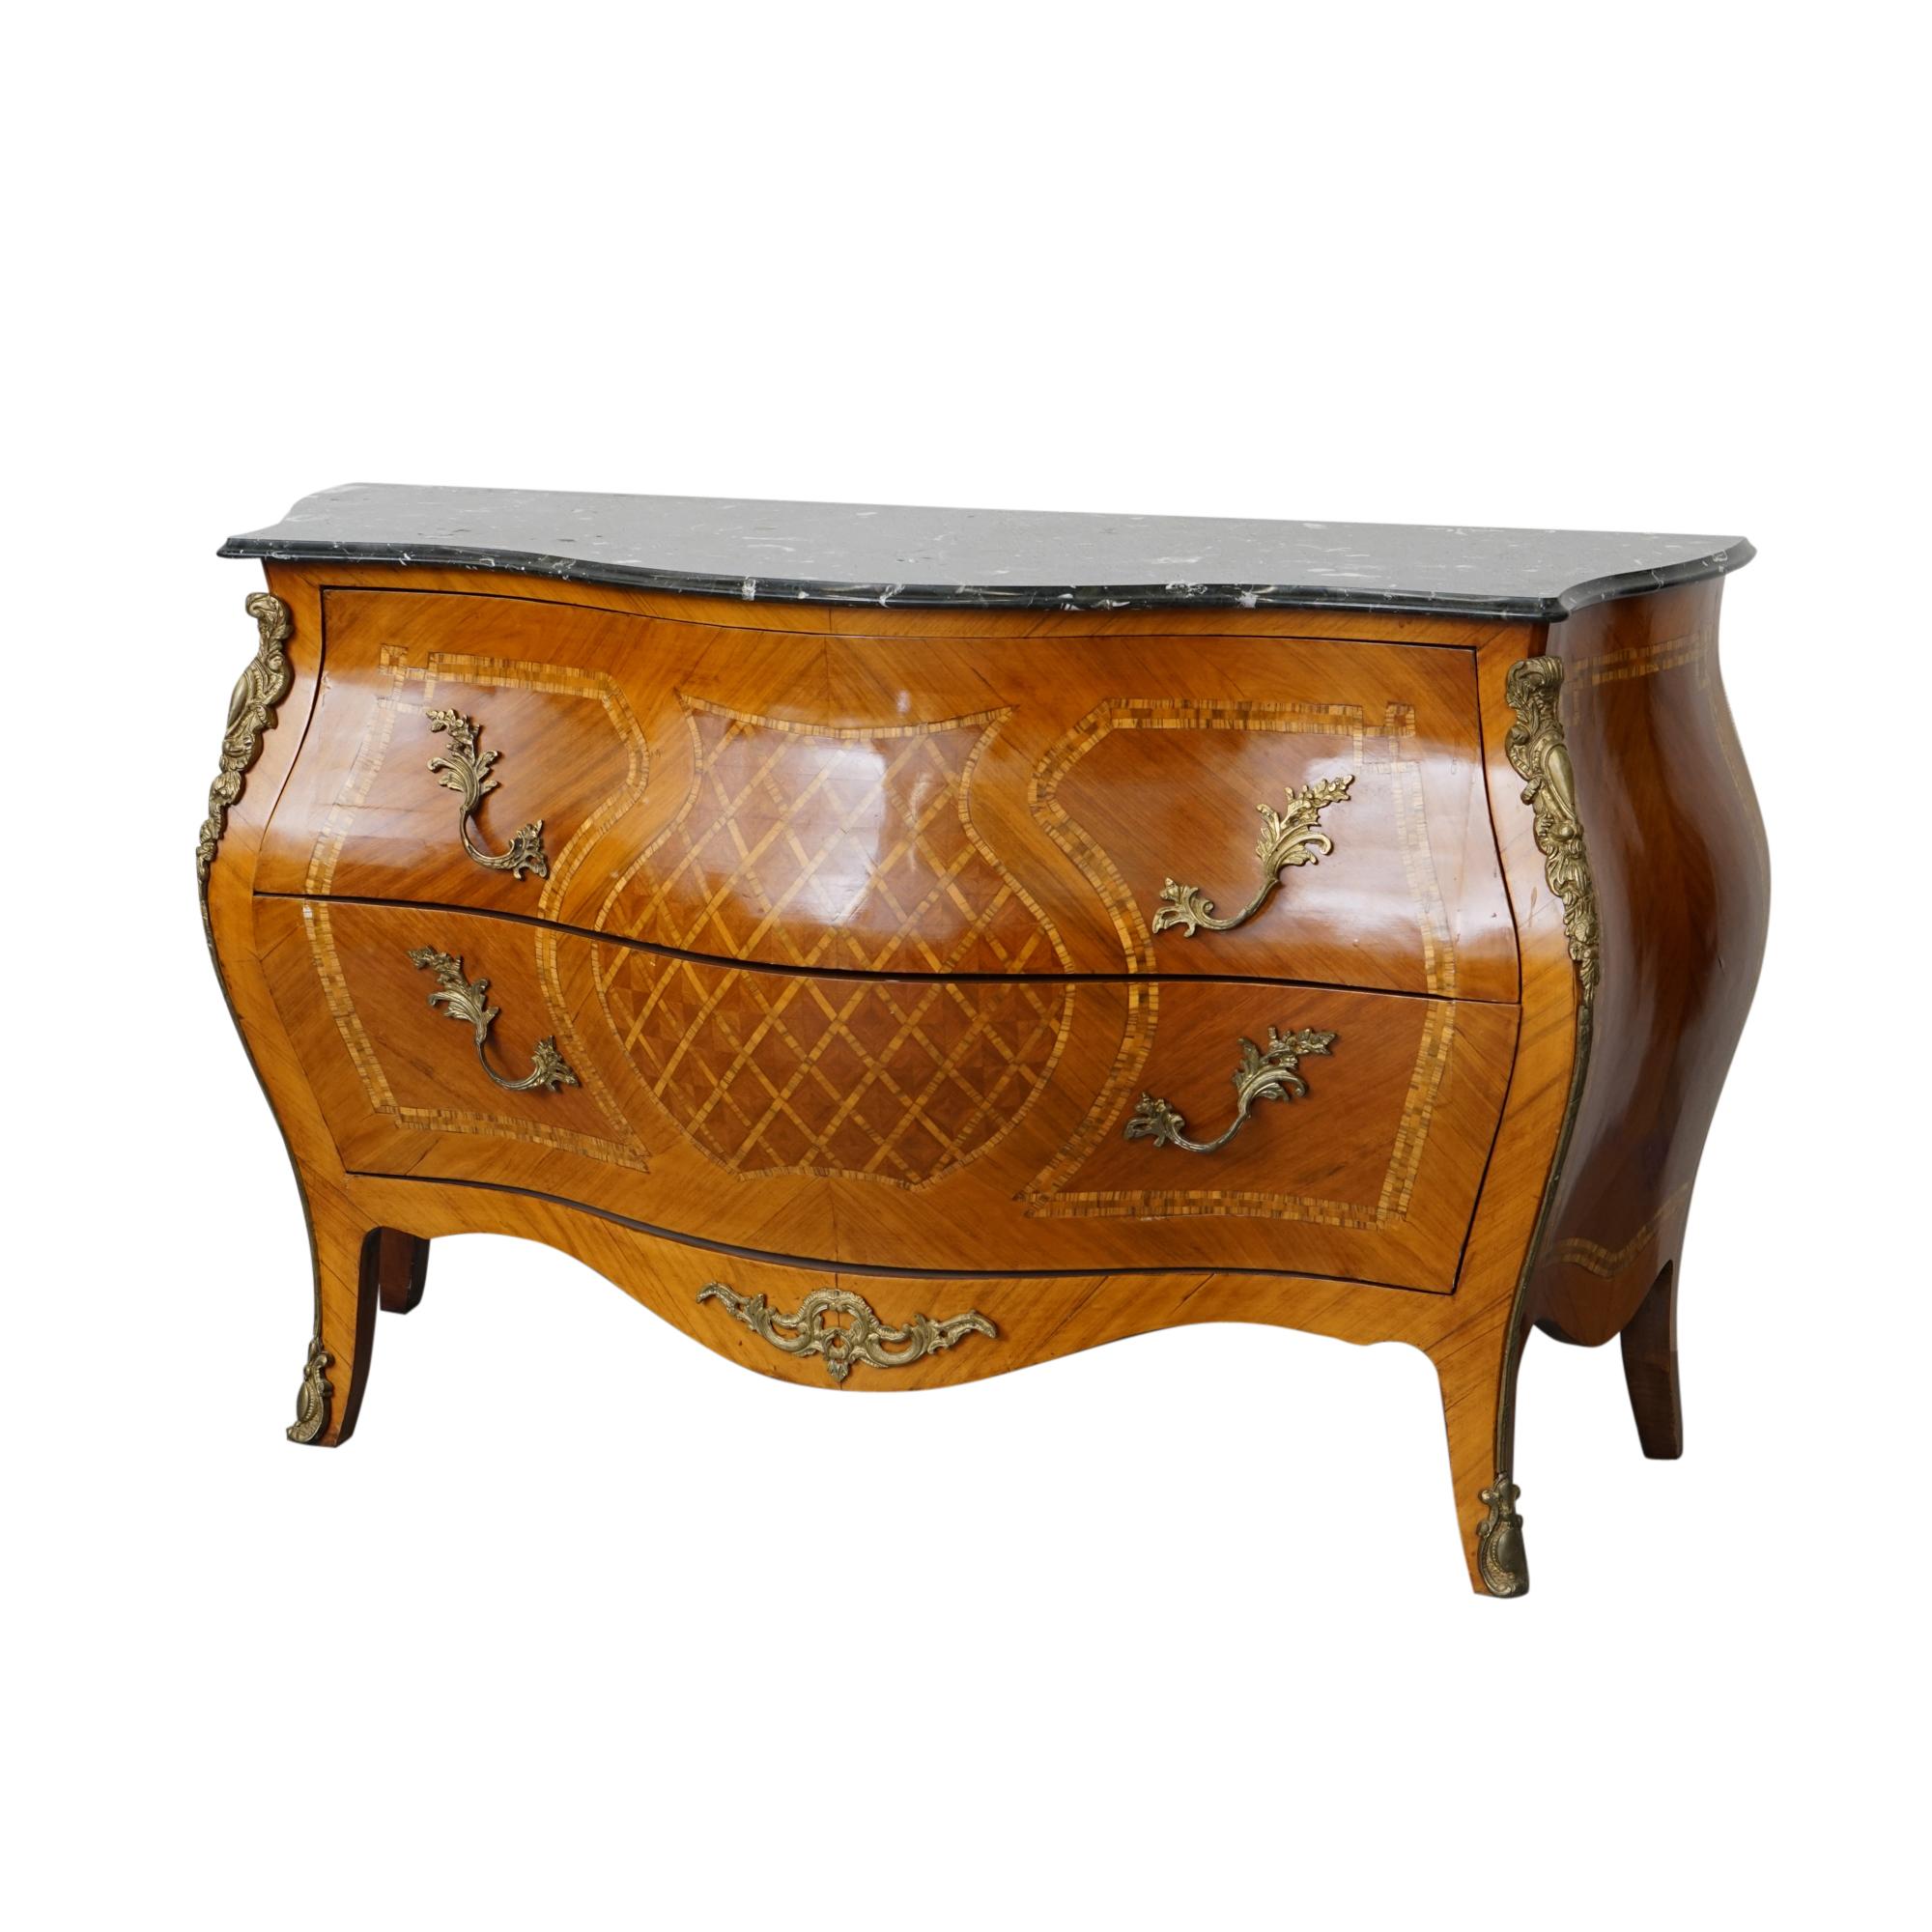 wrought iron sofa set online big square bed furniture auctions | vintage auction ...